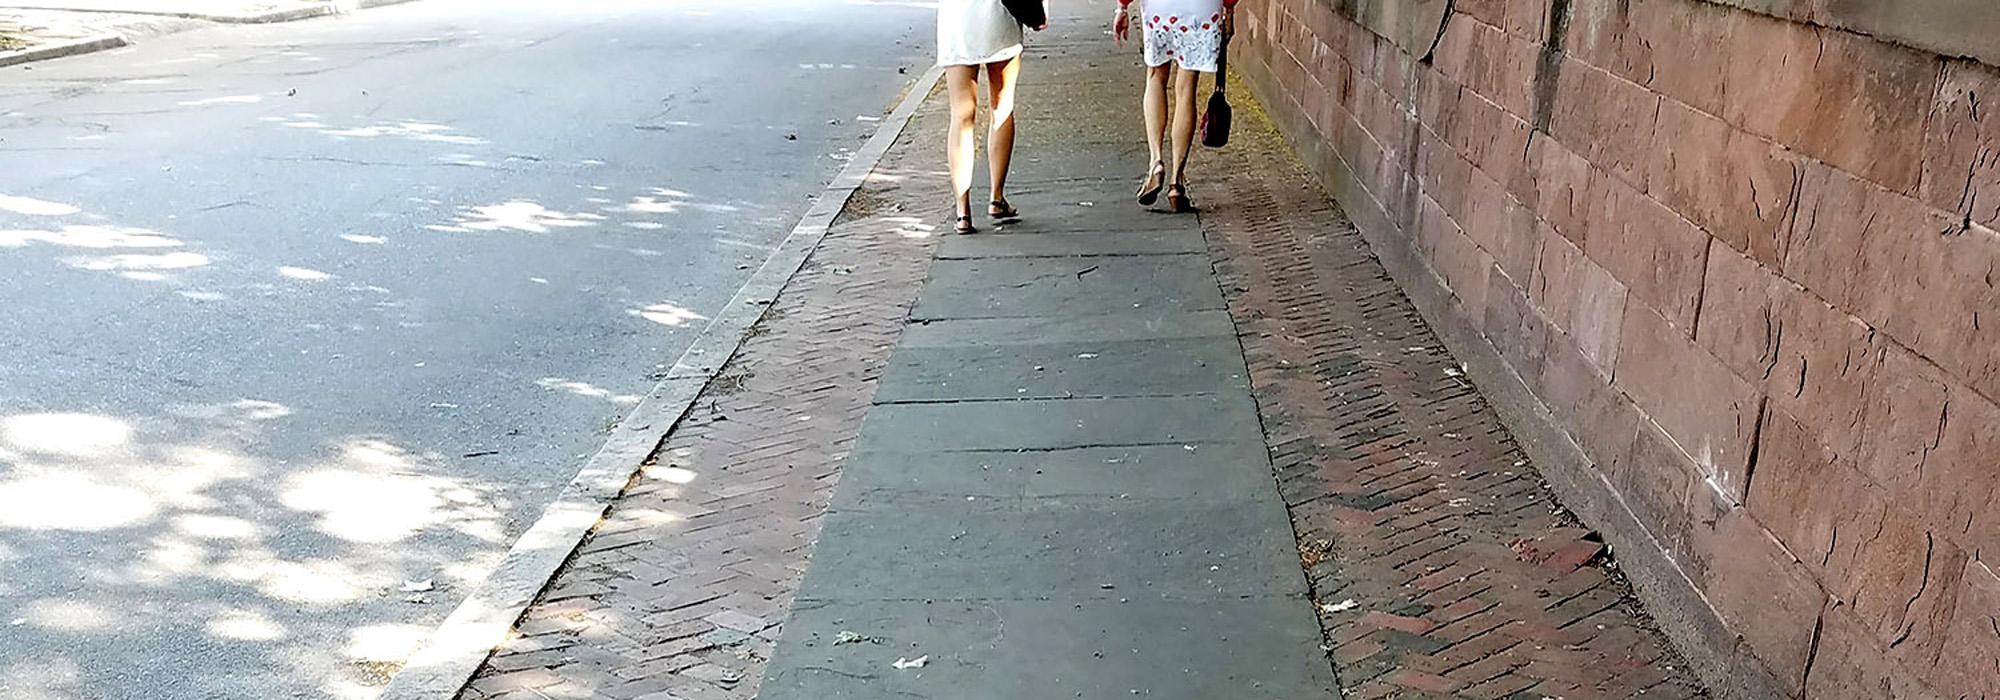 Sidewalks_flagstones_Providence_hero.jpg